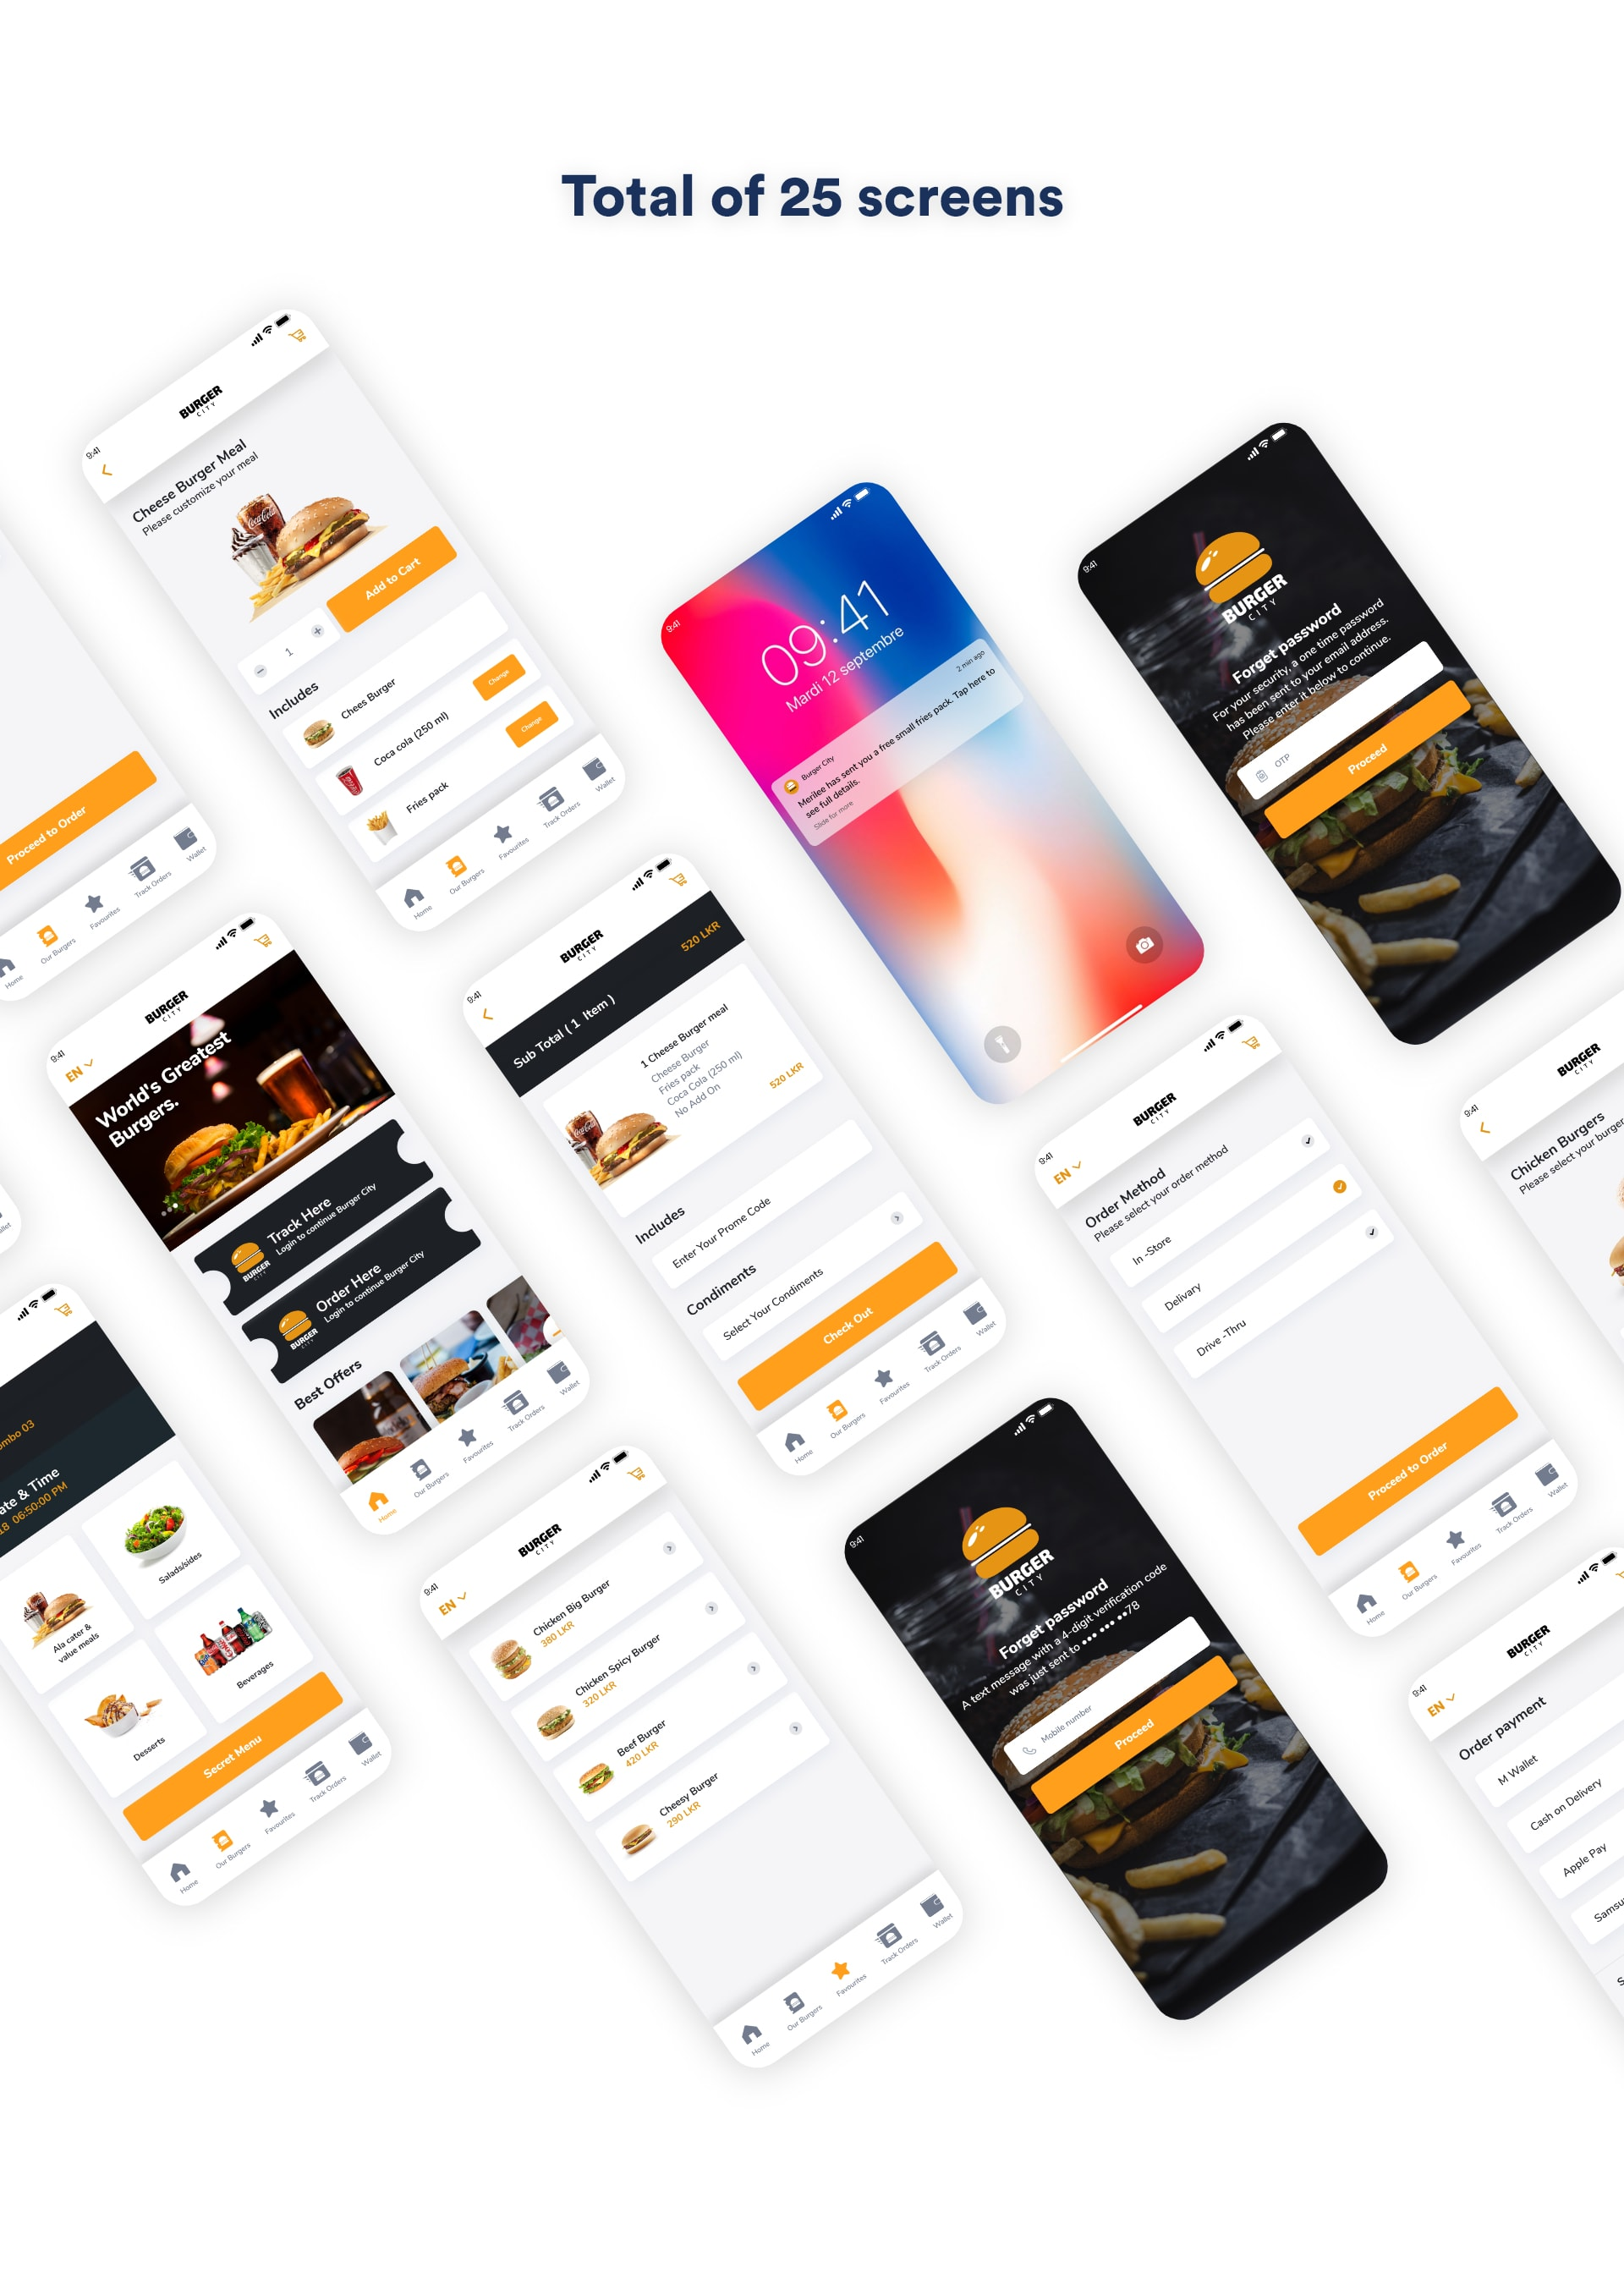 Burger City - Free Adobe XD UI Kit from UIGarage